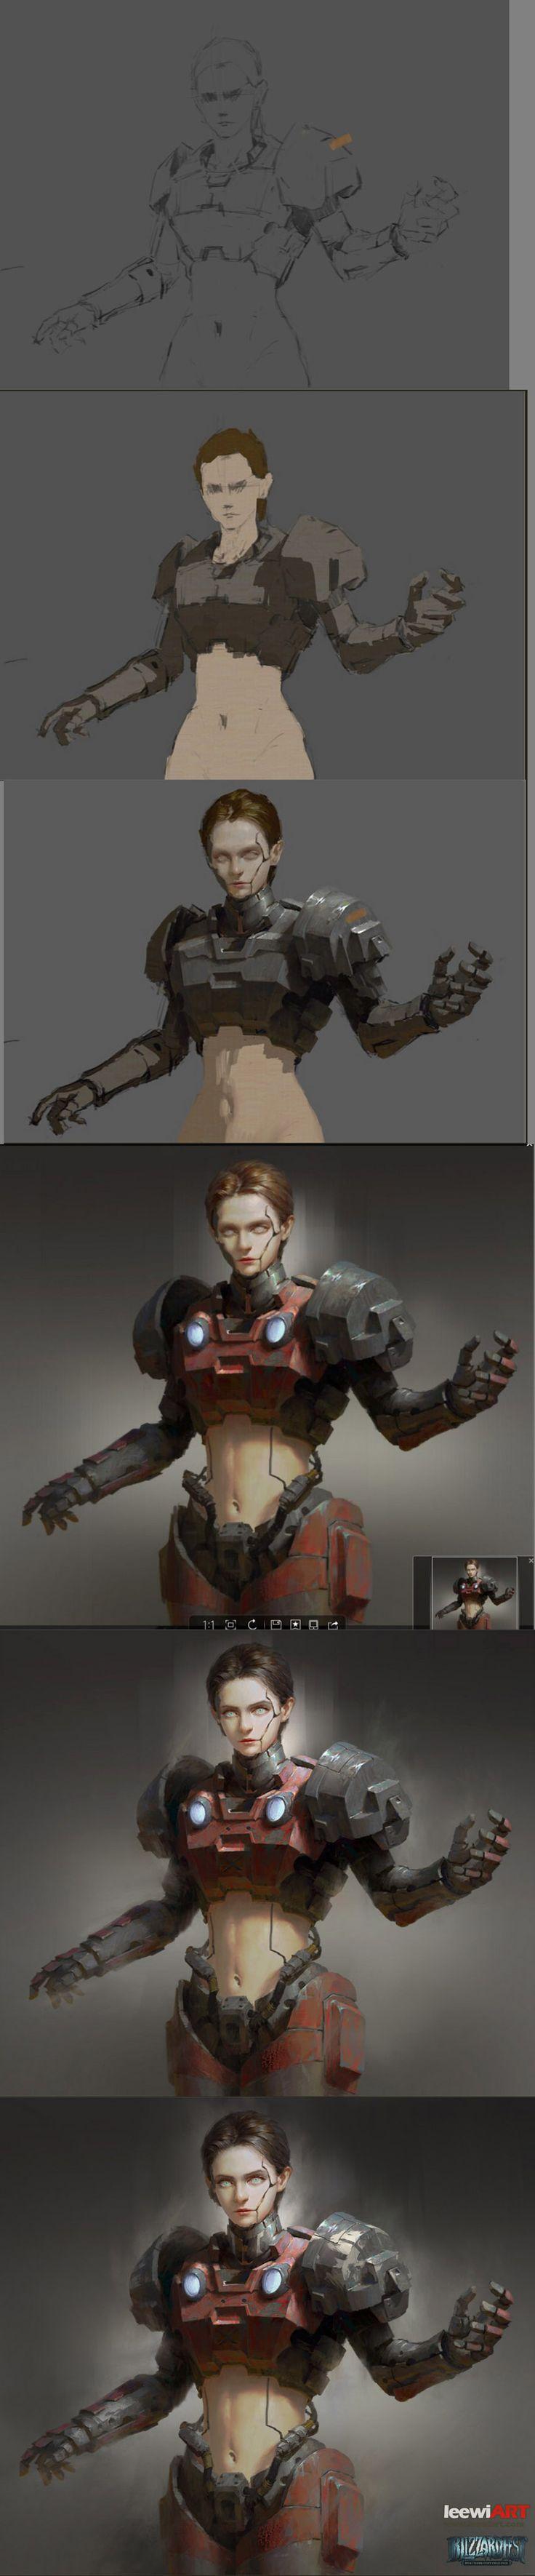 [xiaoyu huang][Marine.(Female soldier)] 活动 | leewiART 乐艺 建立你的个人艺术画廊,汇聚优秀的CG艺术作品